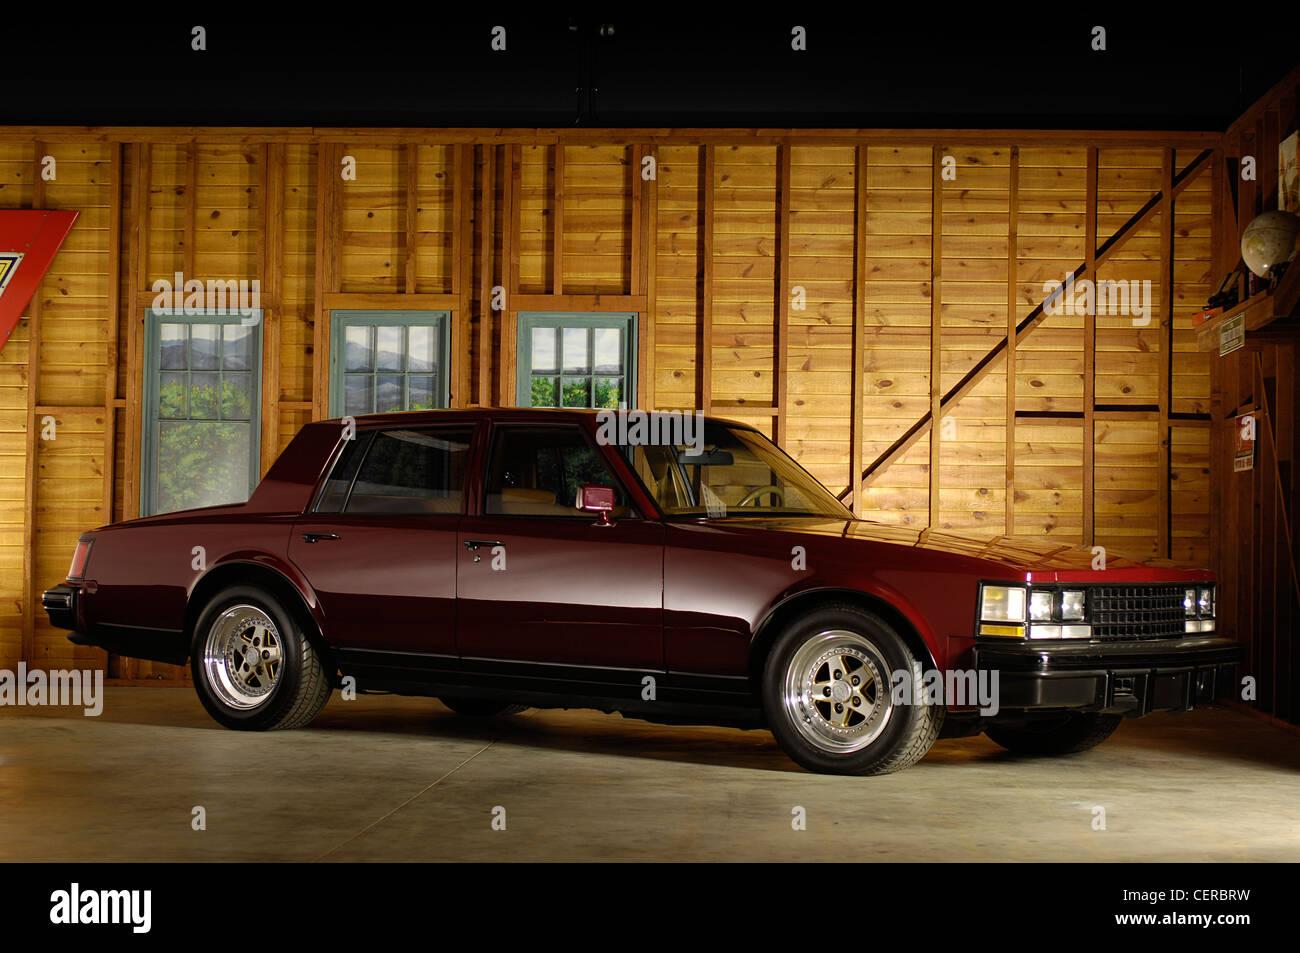 1976 Cadillac Seville Custom - Stock Image